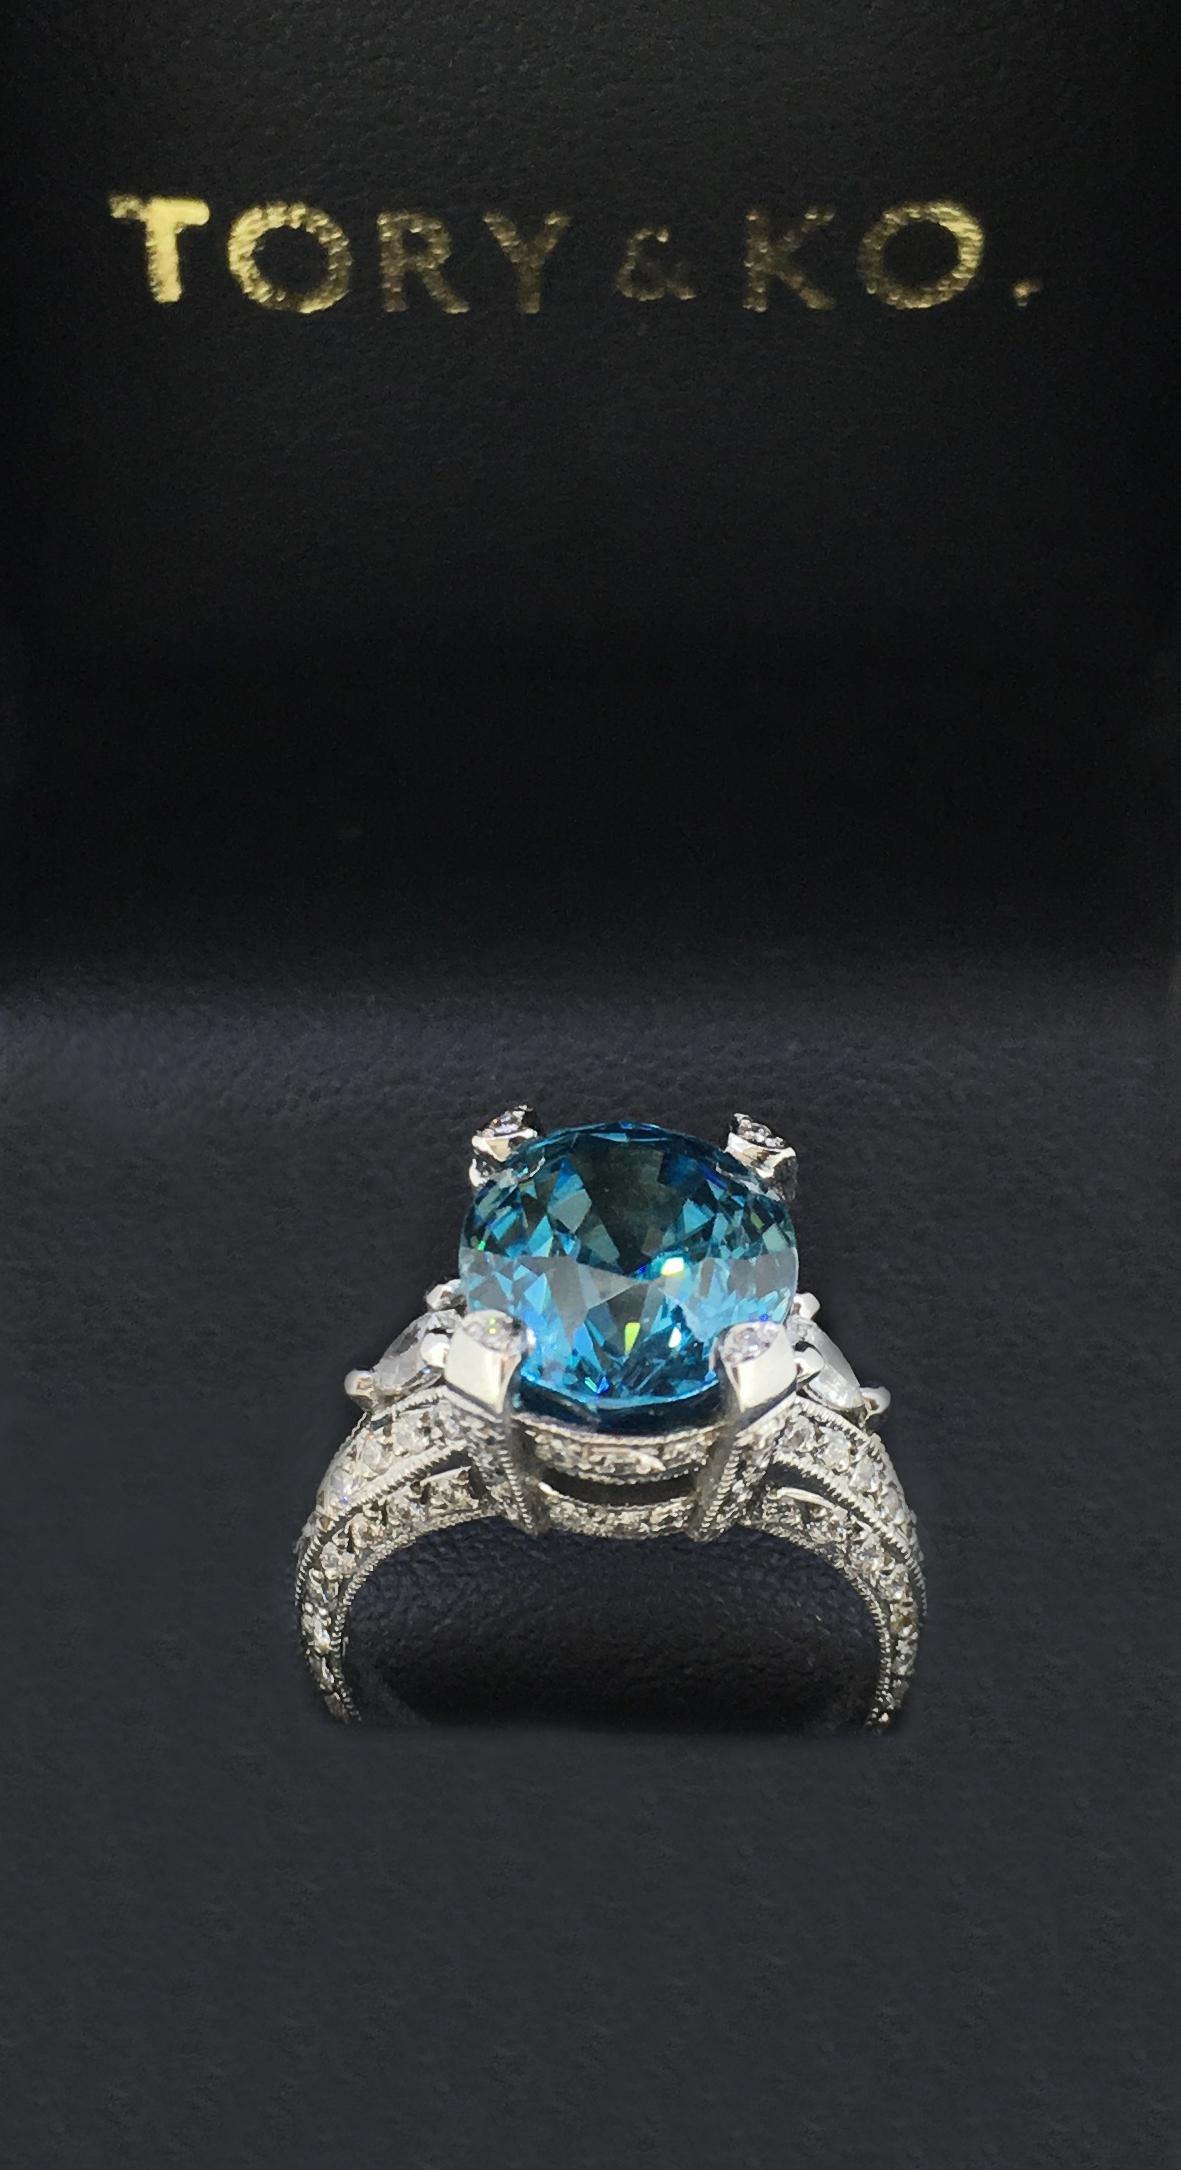 Bespoke Blue Zircon & Diamond Ring